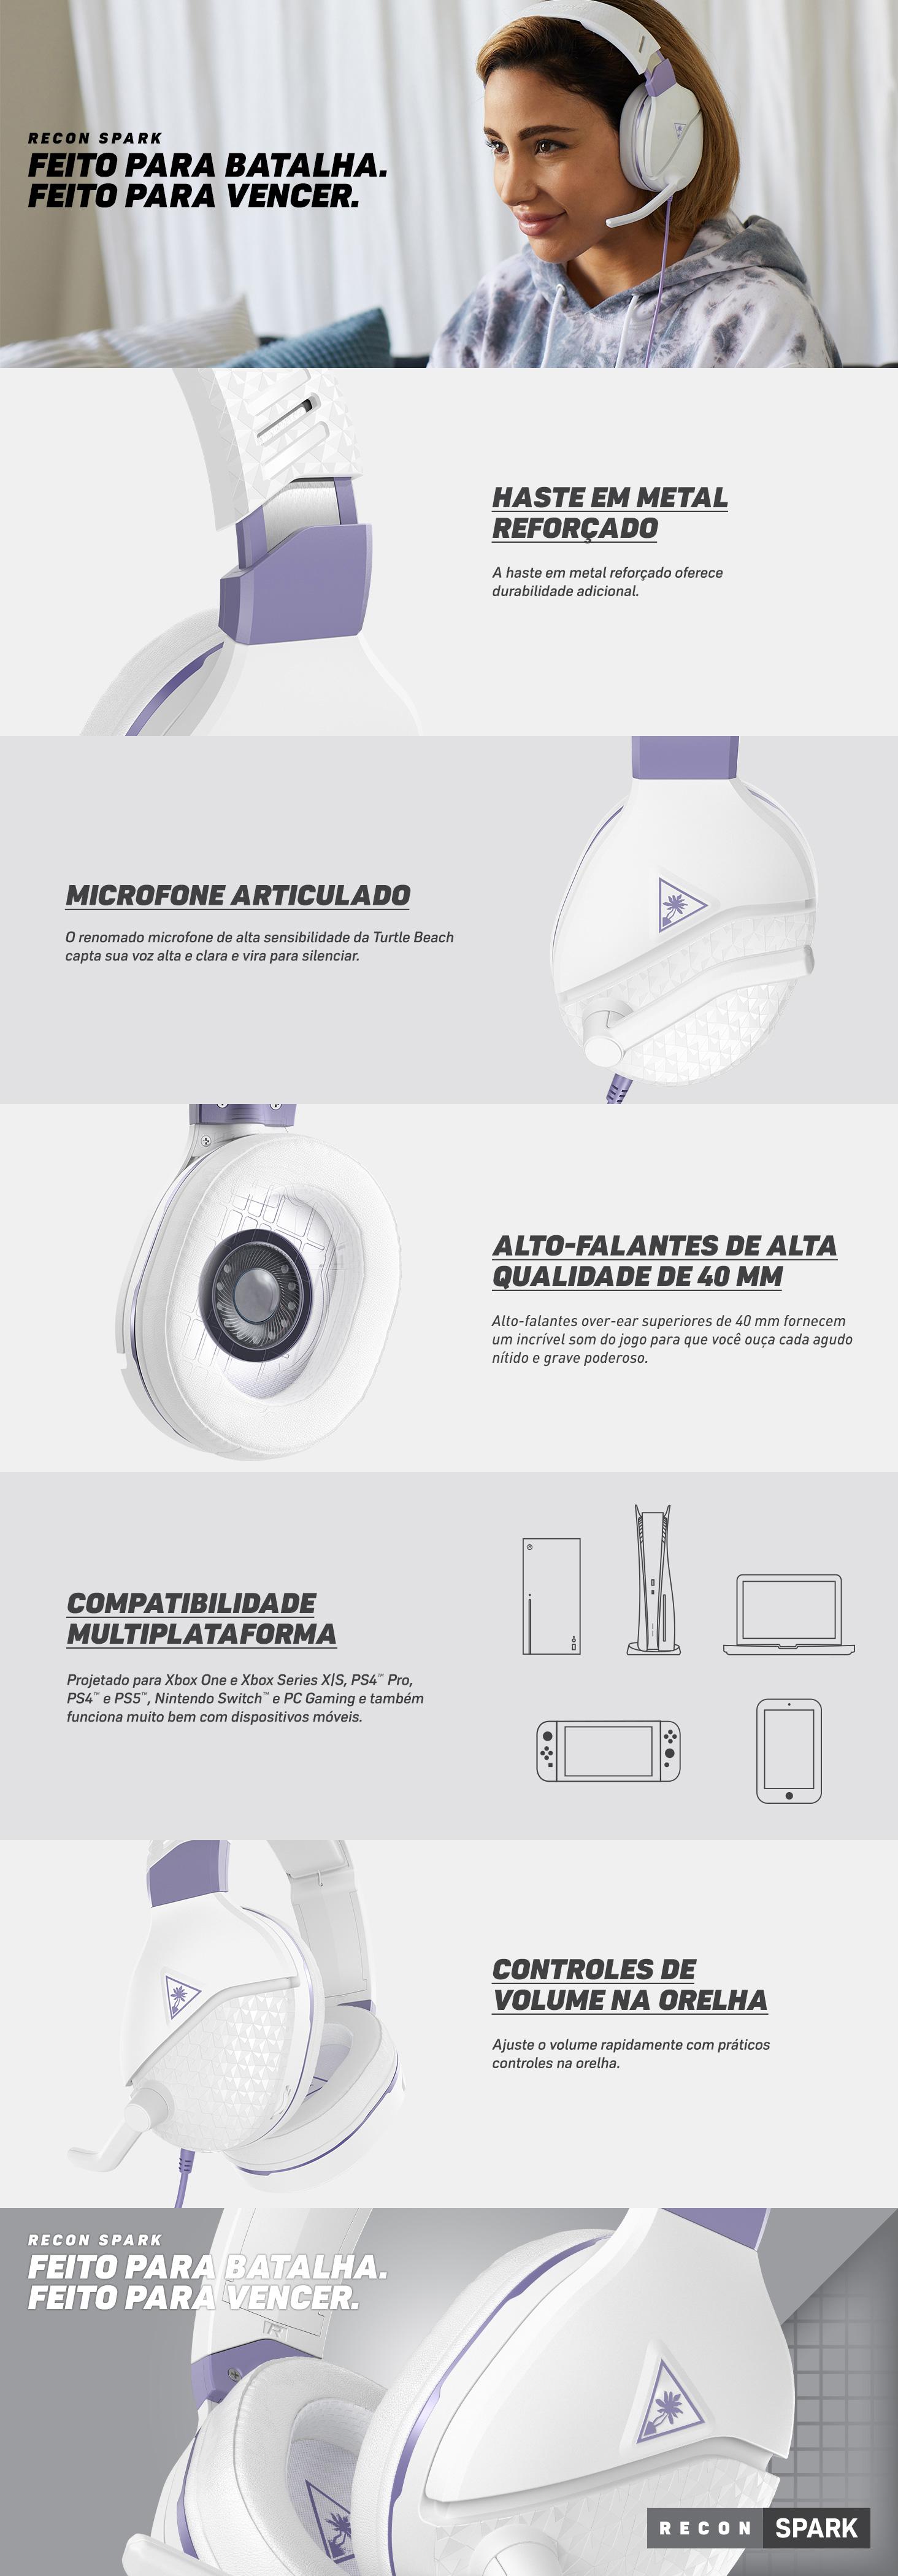 FONE DE OUVIDO C/FIO - RECON